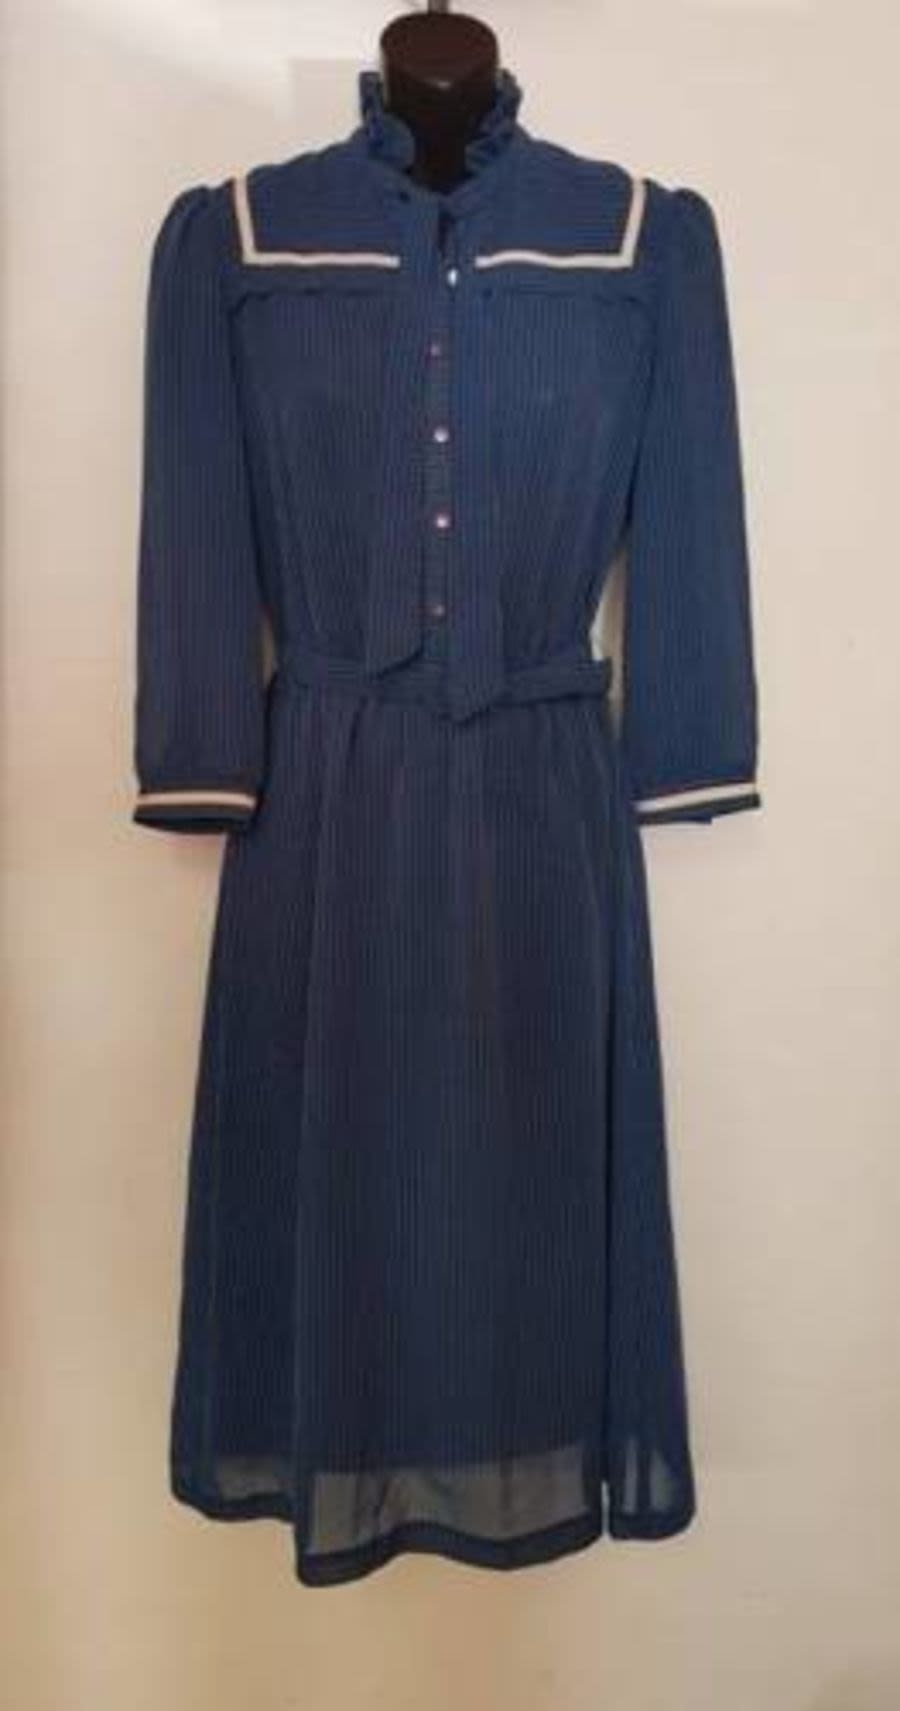 Vintage 1970's Blue Pinstriped Dress